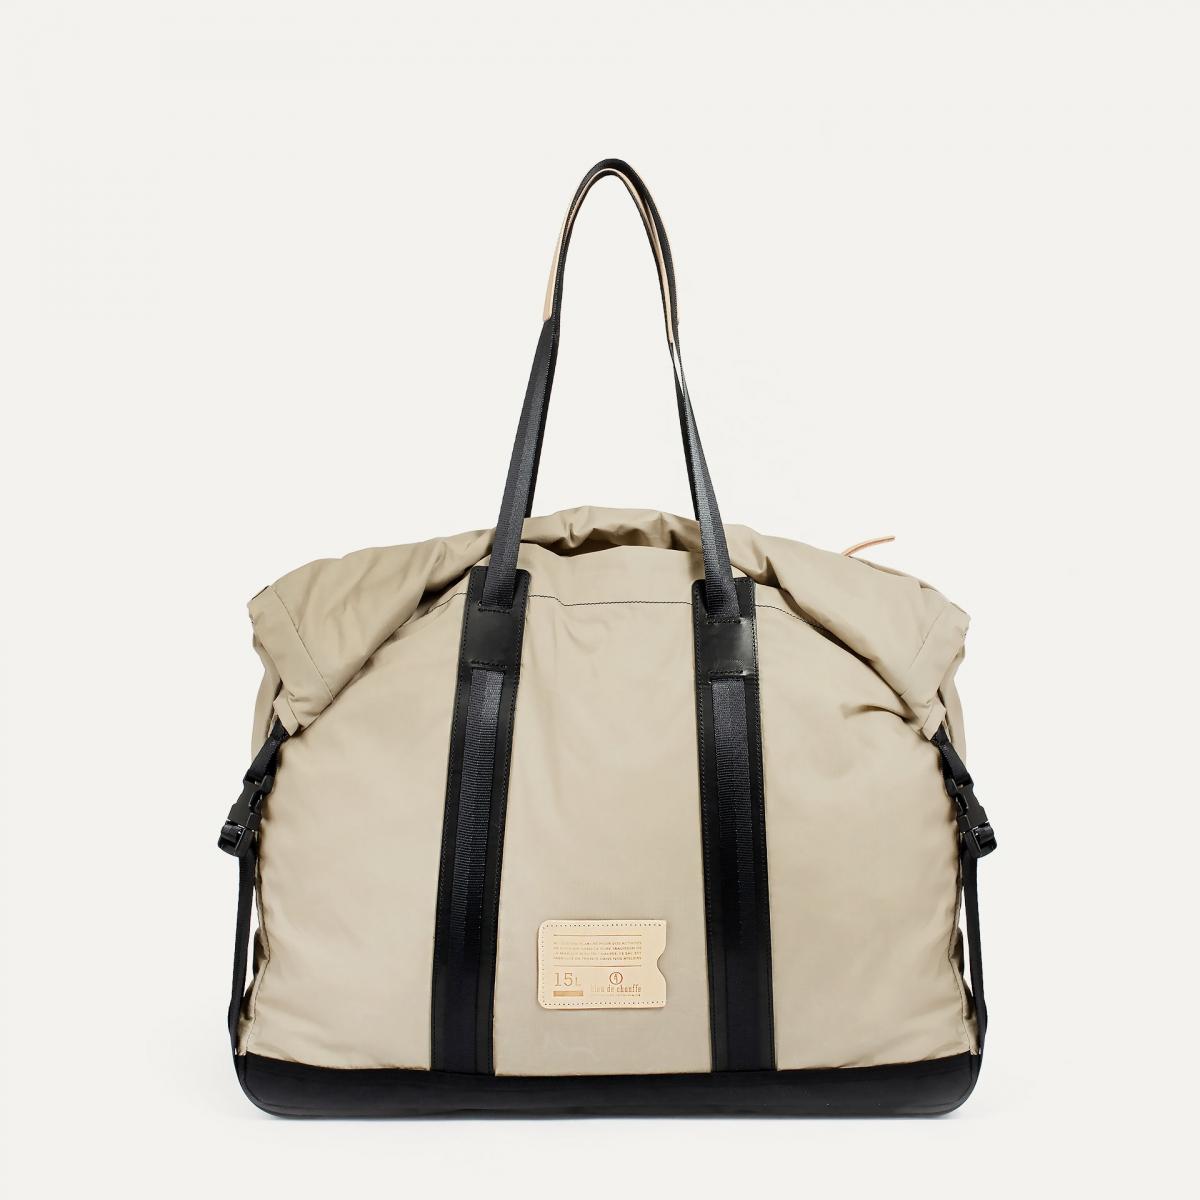 15L Barda Tote bag - Beige (image n°1)